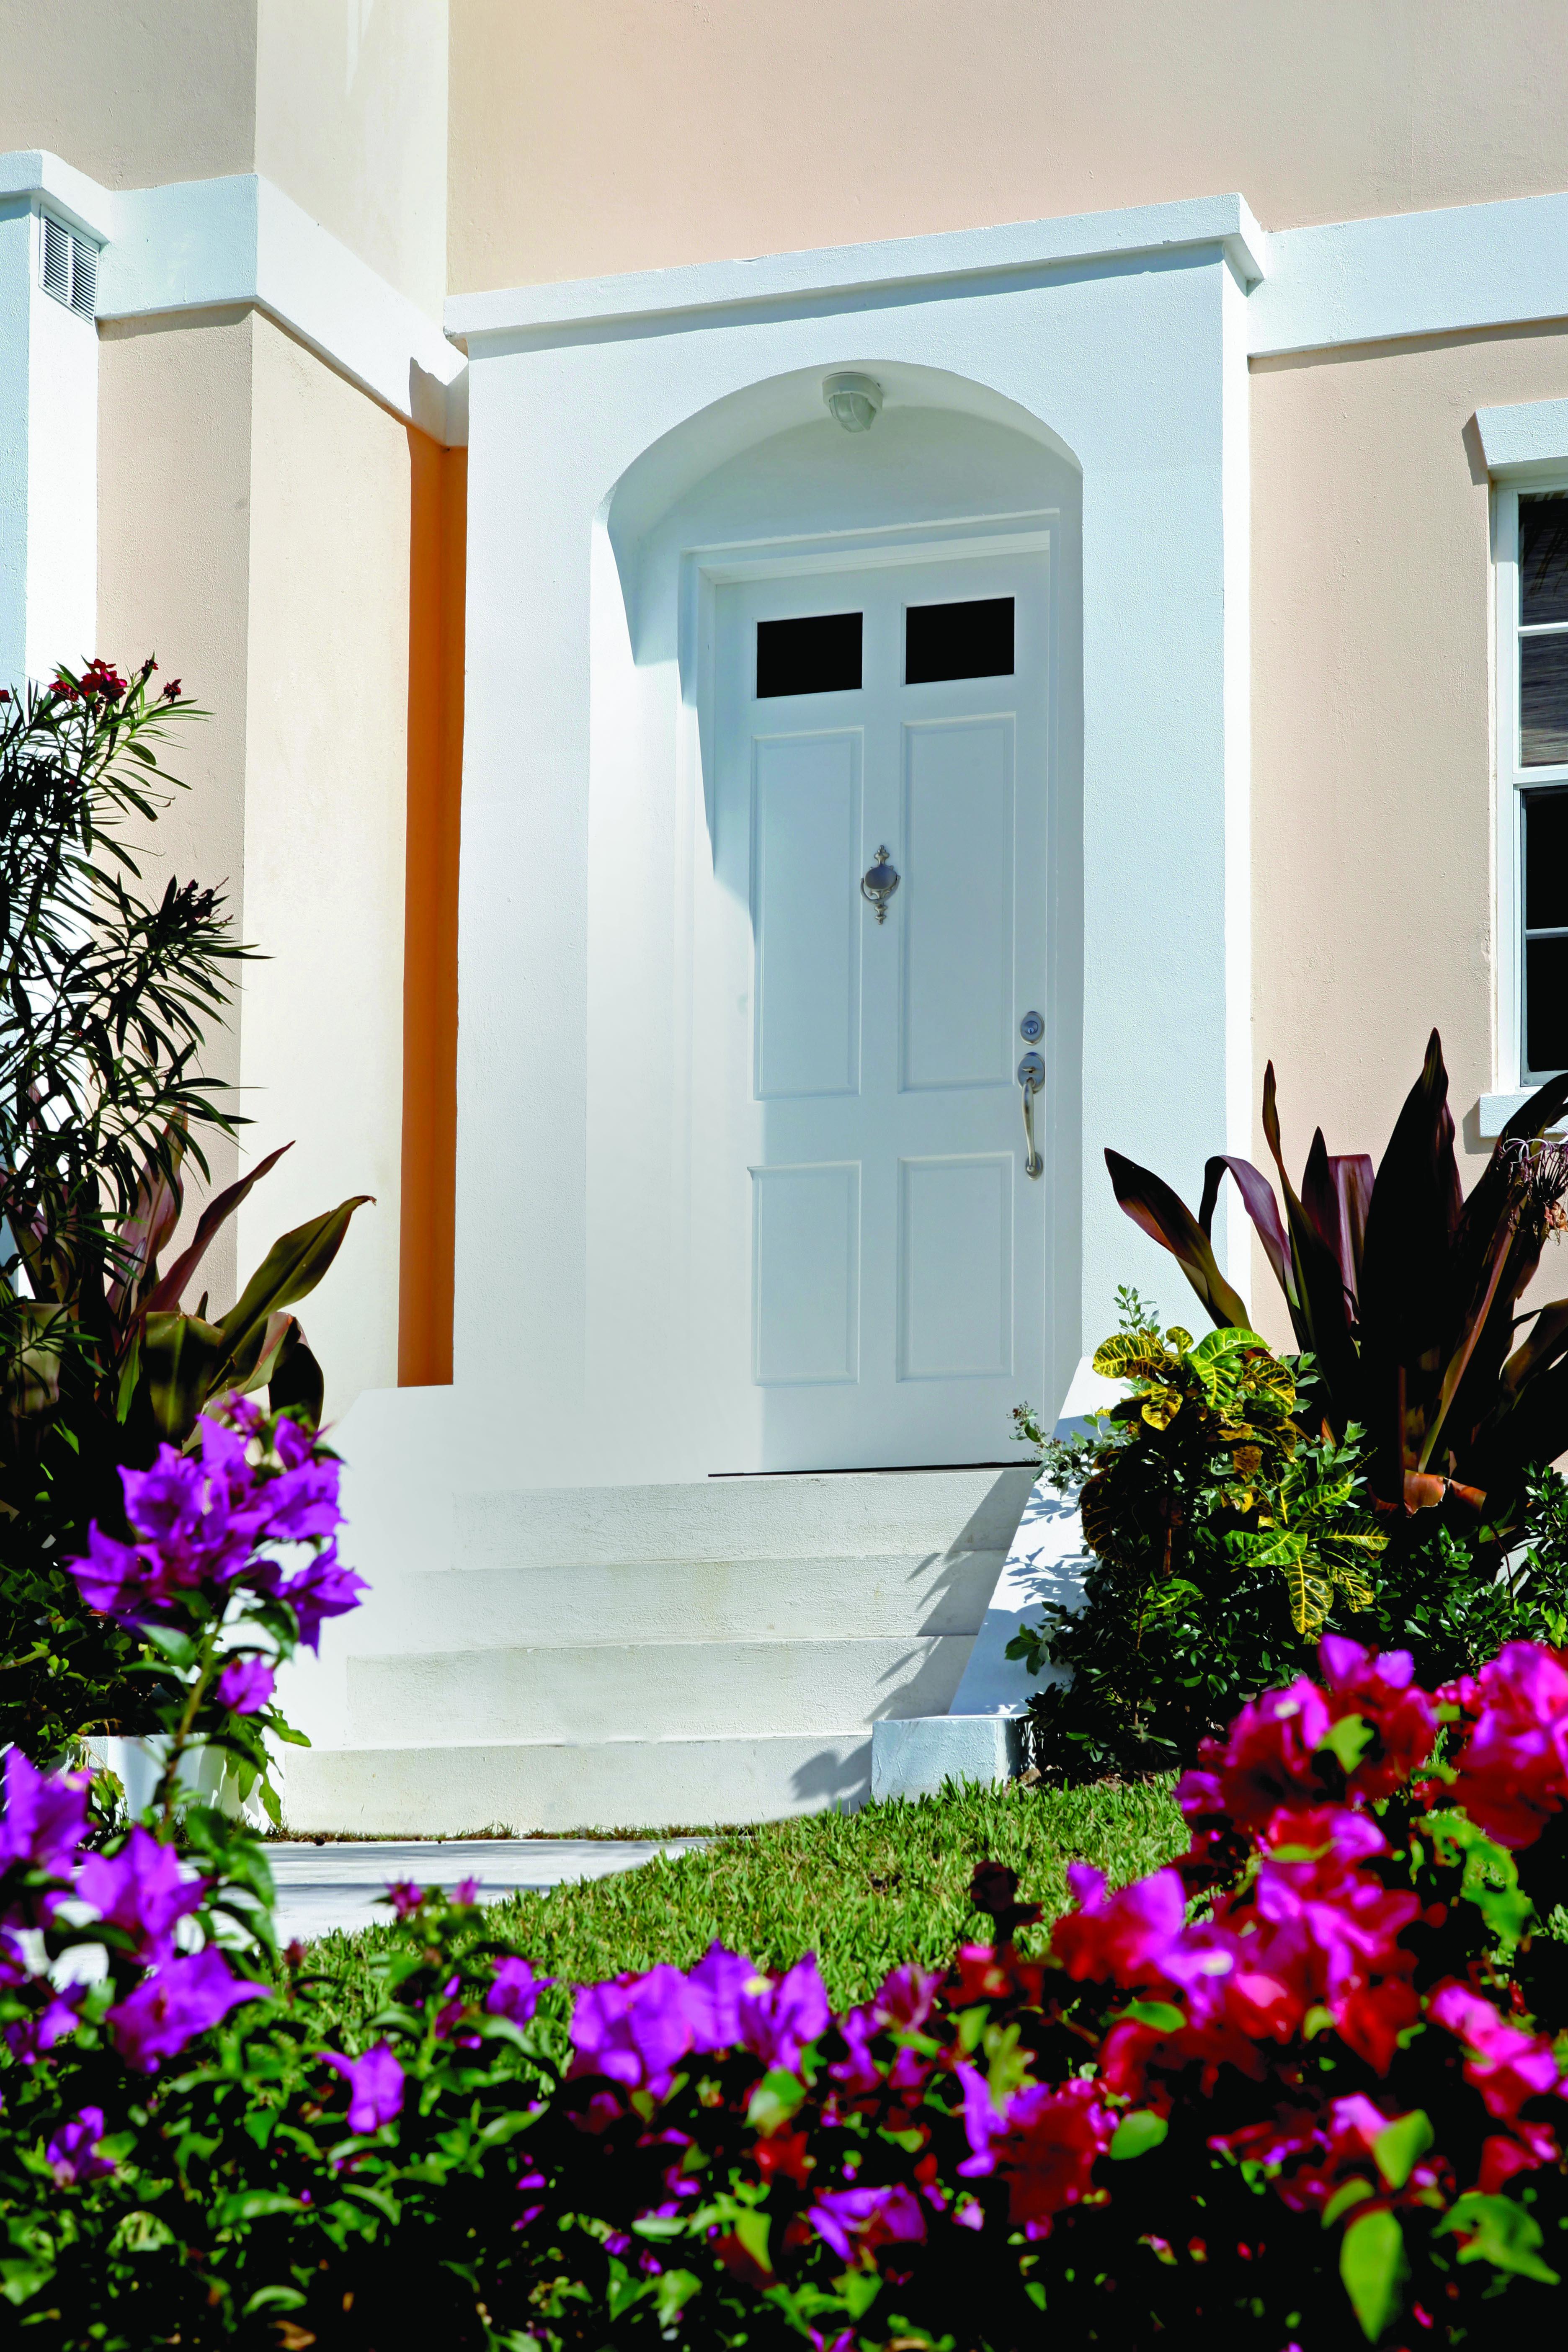 Broker Login - Secure Luxury Bahamas Marina Homes and Condos